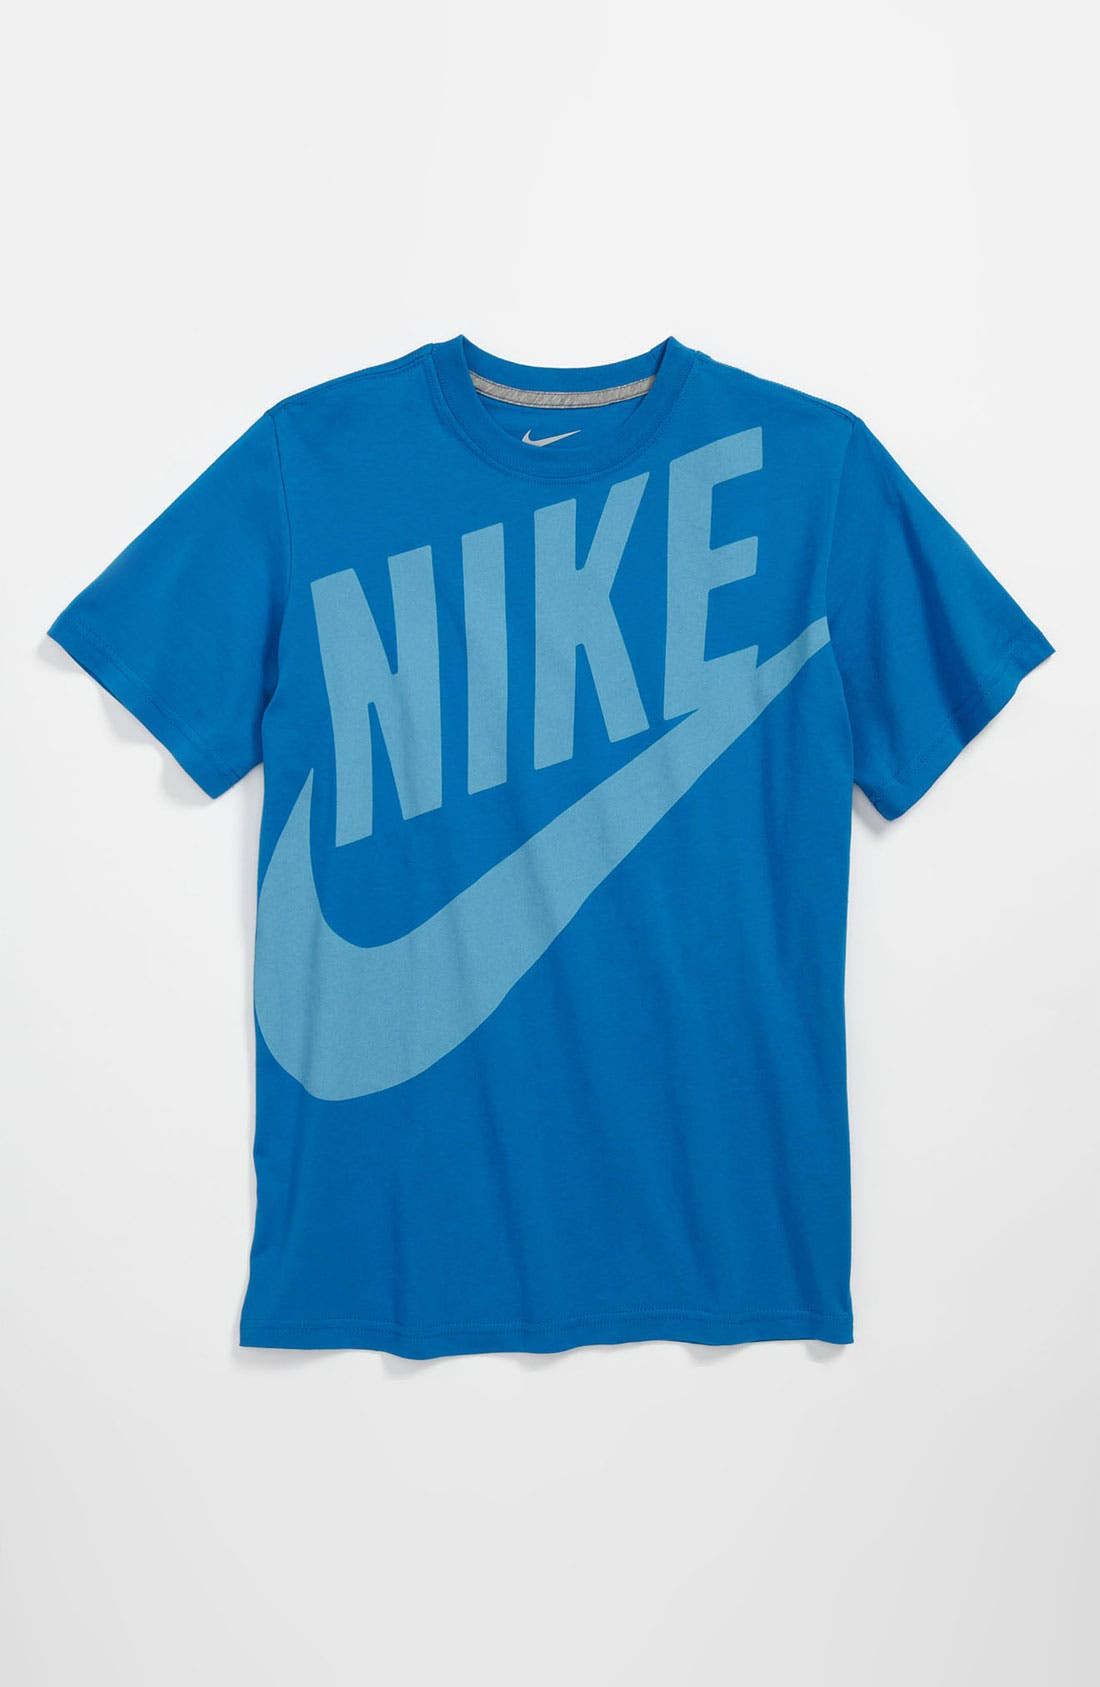 Alternate Image 1 Selected - Nike 'Futura' T-Shirt (Big Boys)